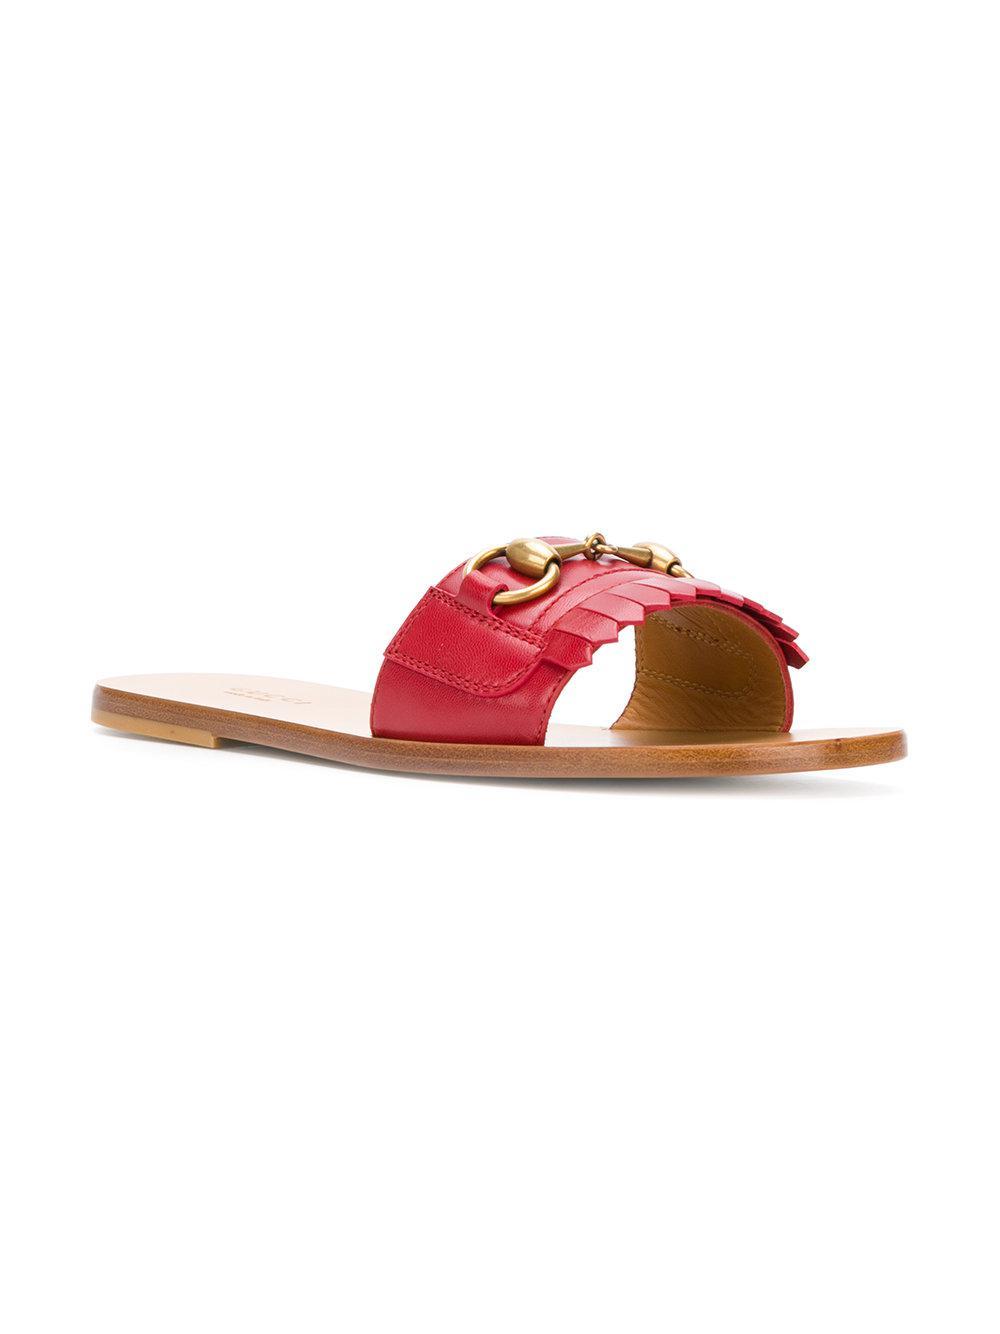 0f5bcf7c712015 Gucci - Red Open Toe Sandals - Lyst. View fullscreen